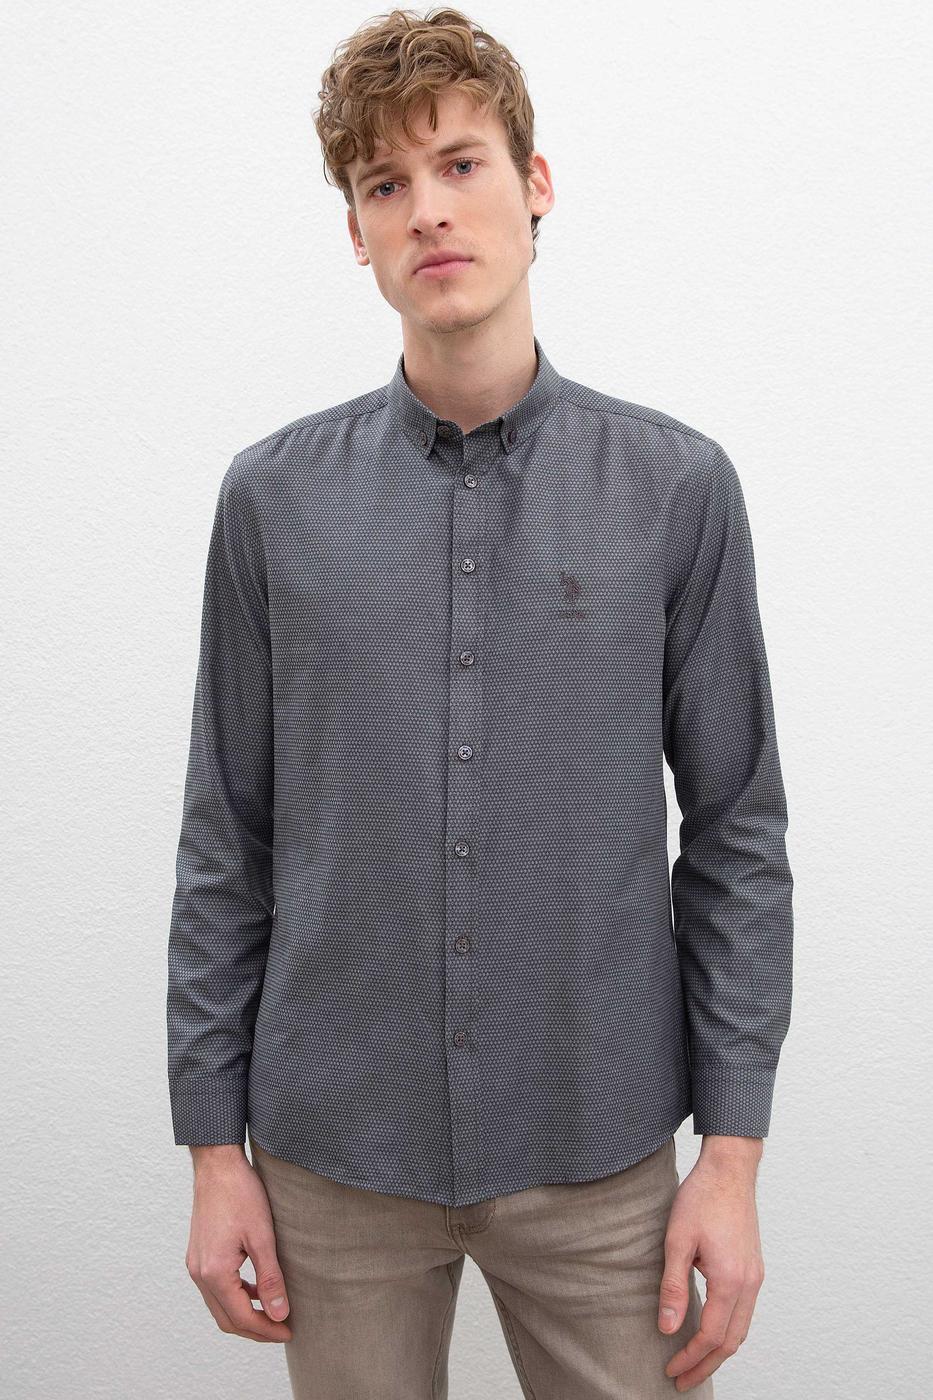 Gri Gömlek Uzunkol